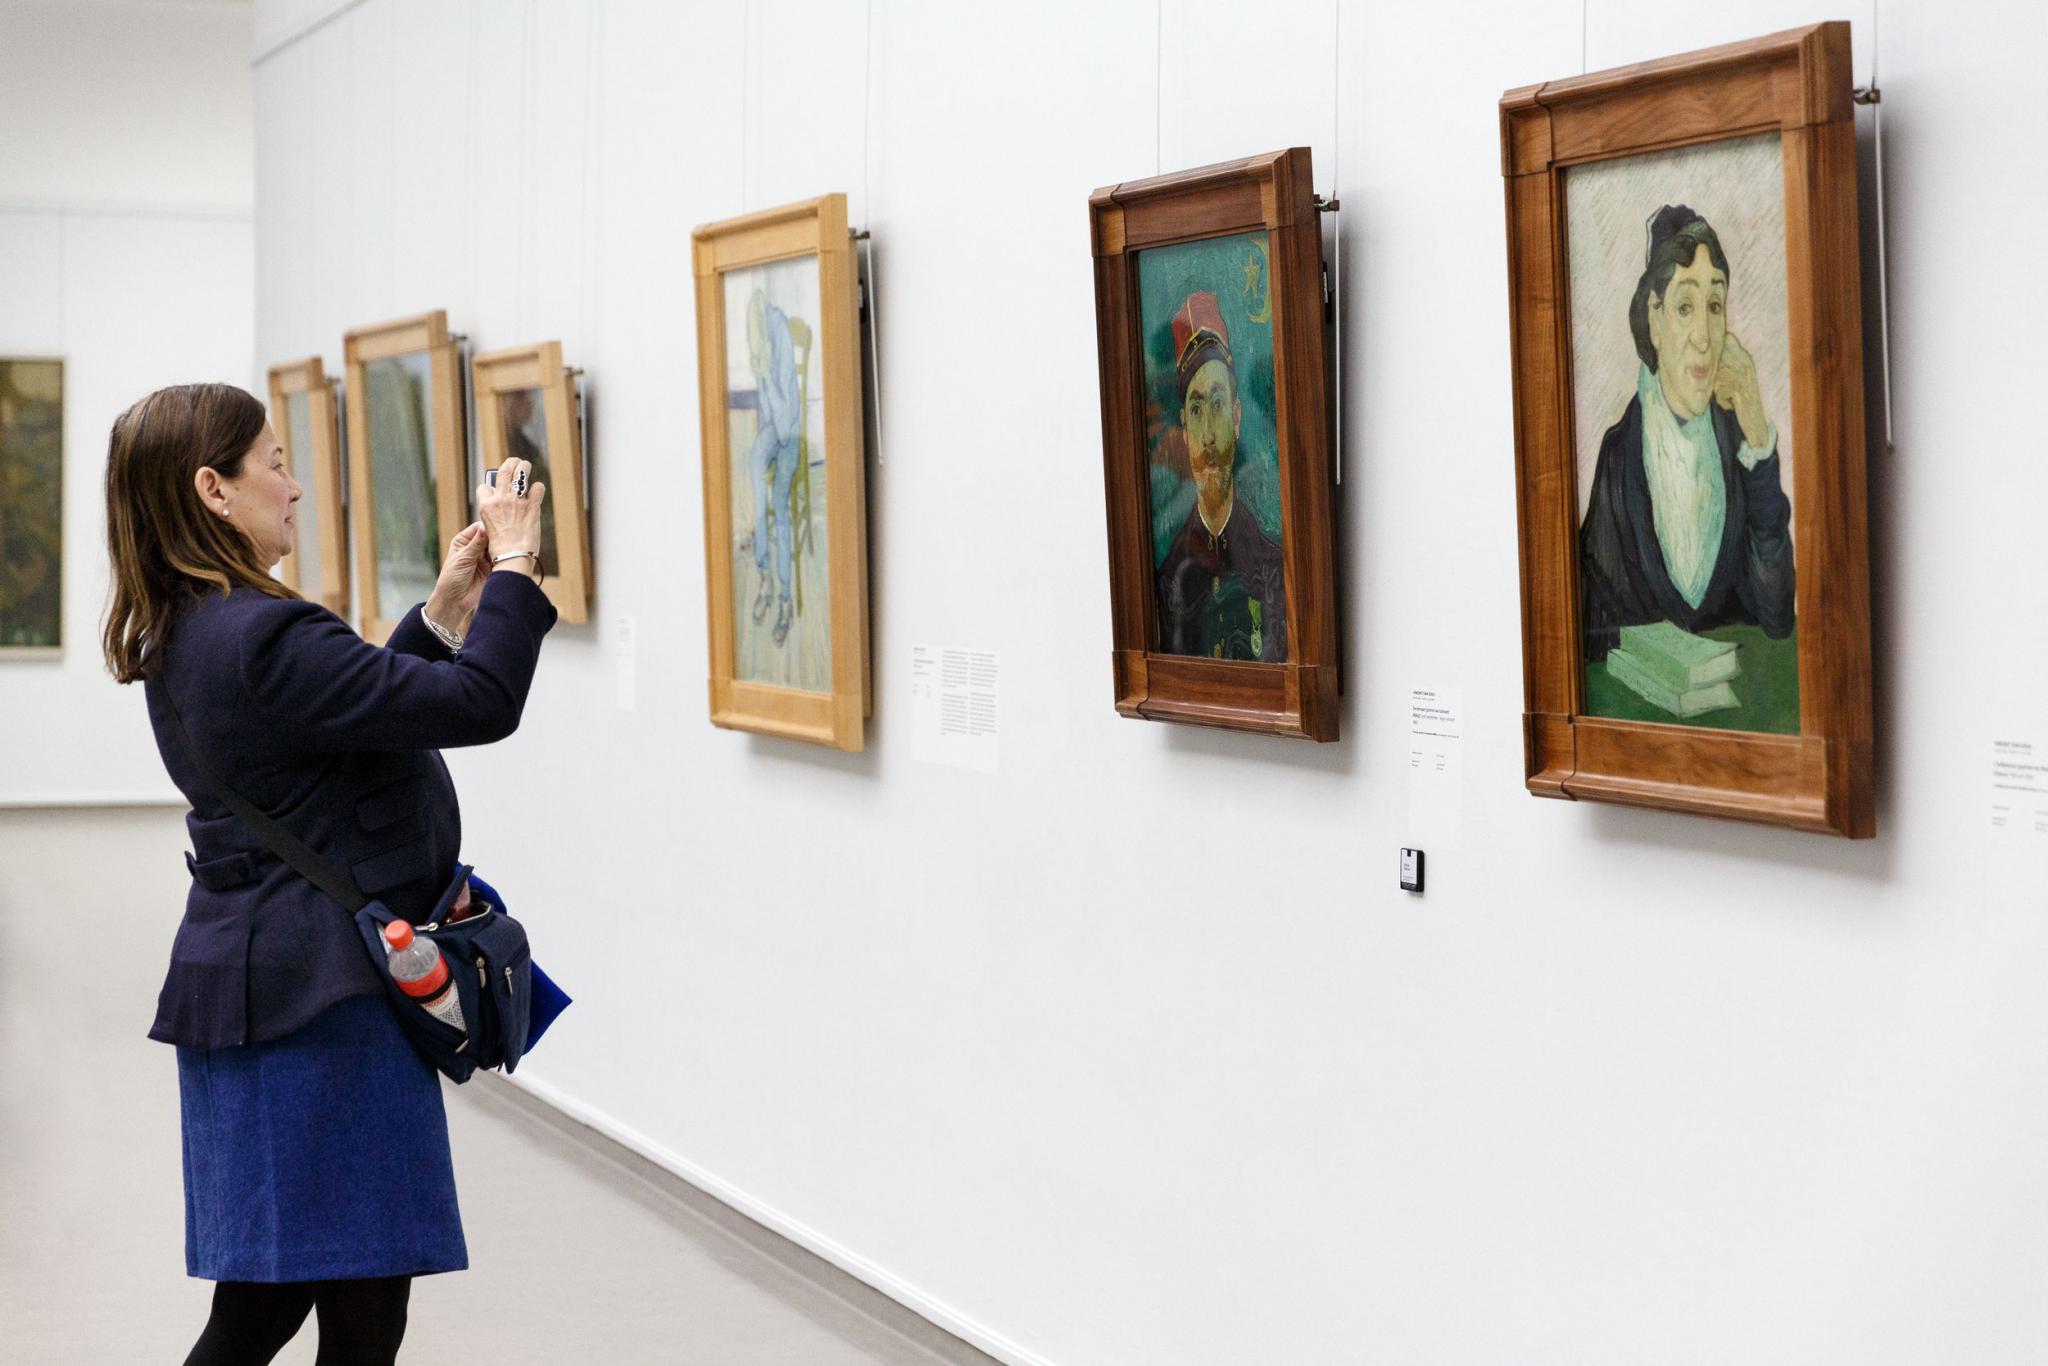 Large-Bezoeker in de Van Gogh Galerij - Visitor in the Van Gogh Gallery, photo_ Wieneke Hofland